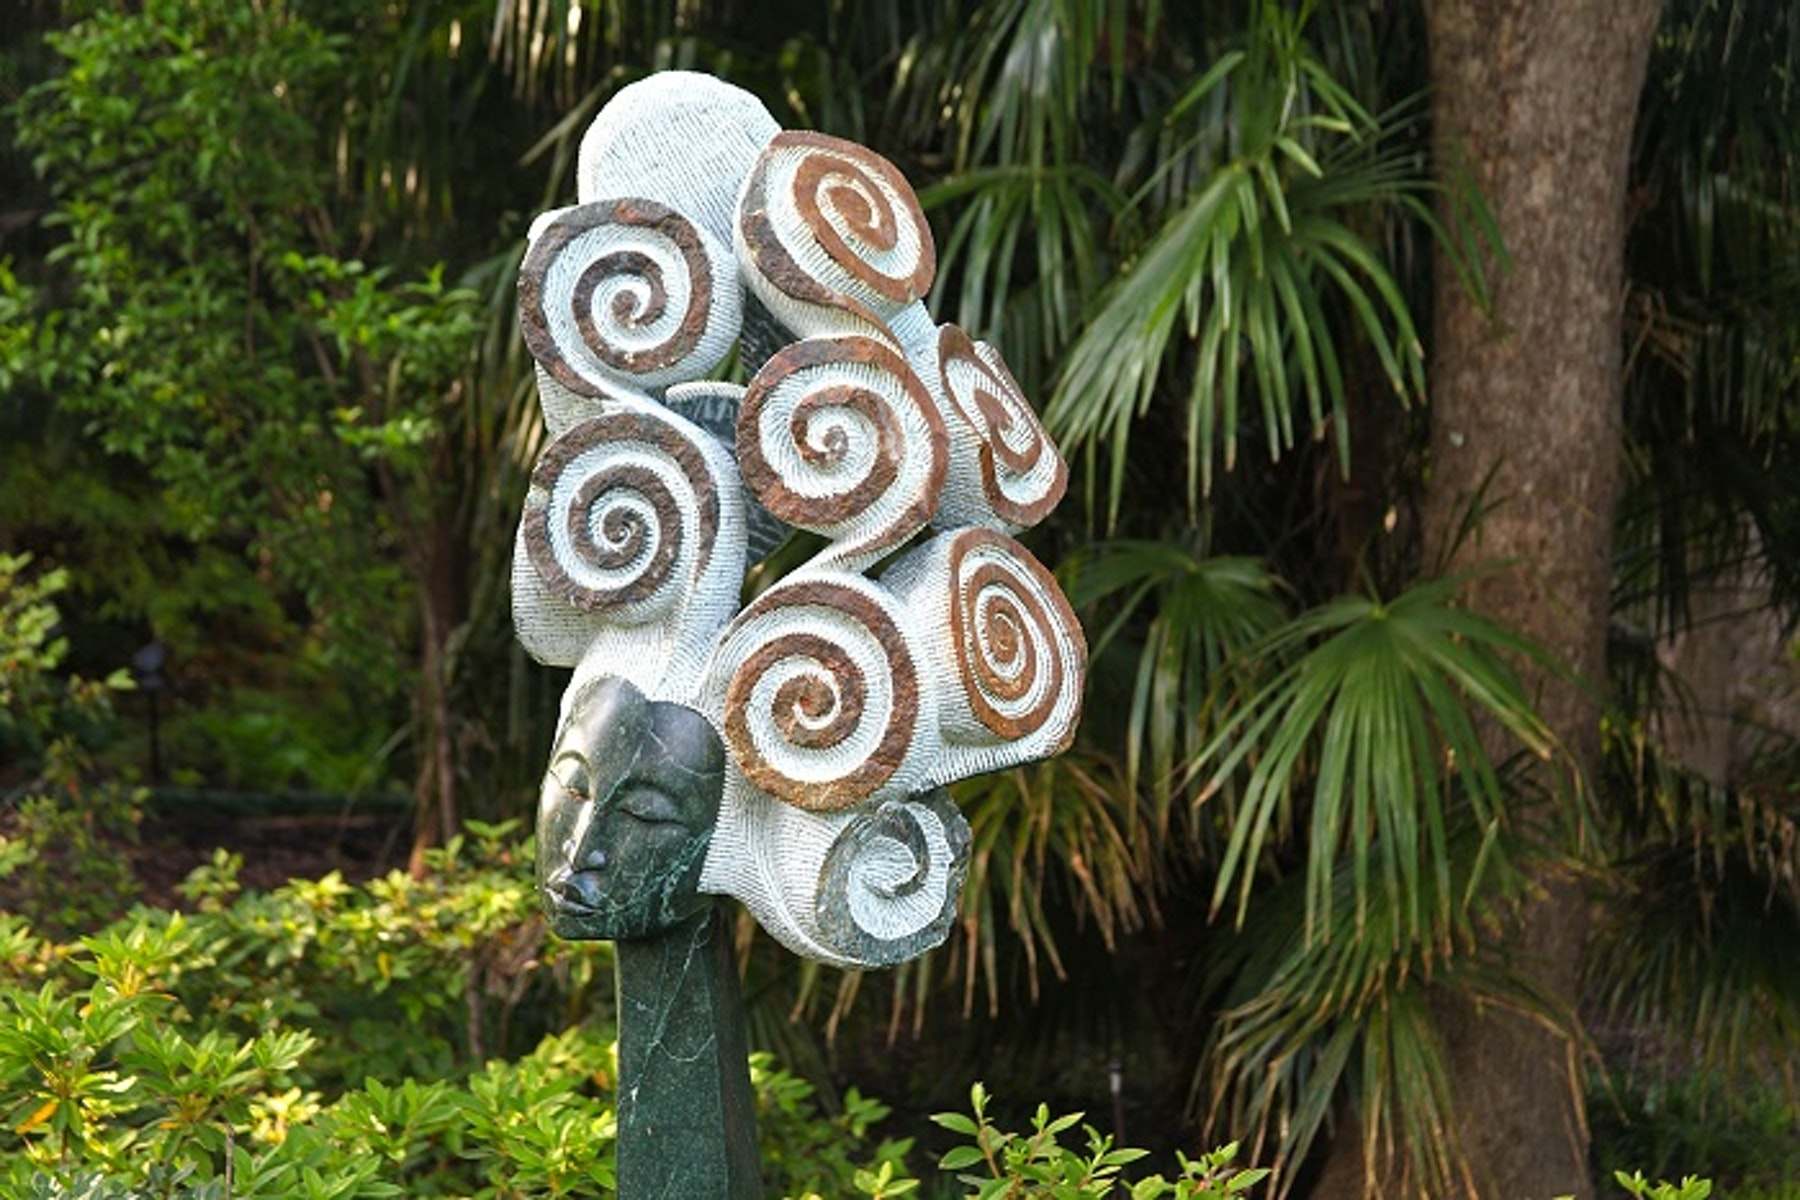 The Dallas Arboretum Presents the Return of ZimSculpt